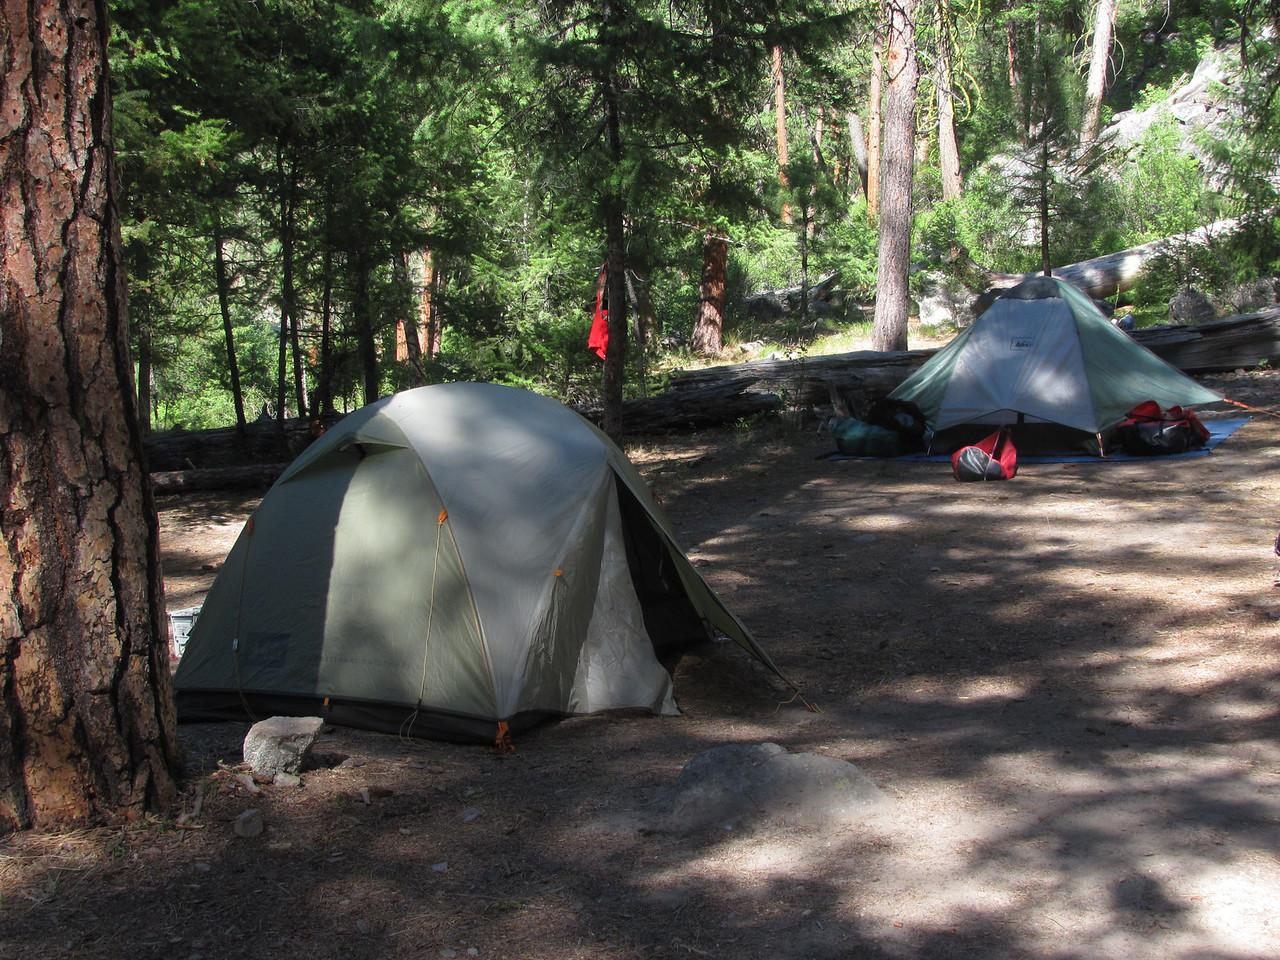 Little Soldier Camp